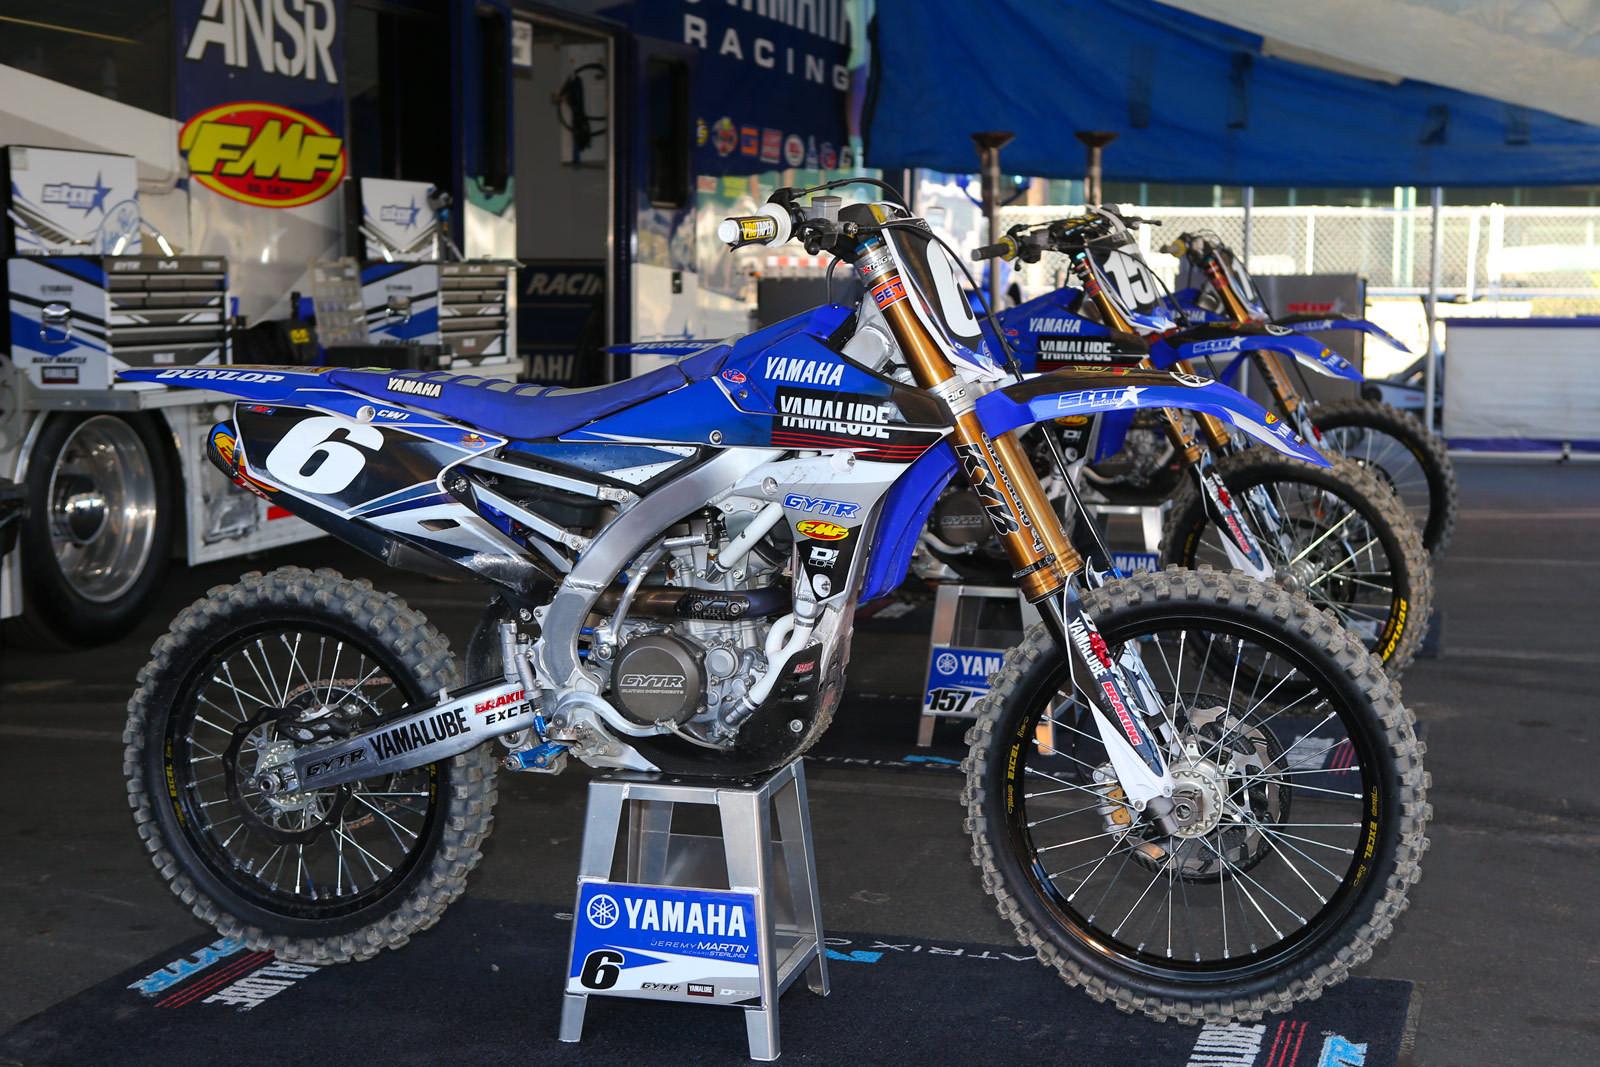 Jeremy martin first look 2015 bikes of supercross for Martins yamaha ocala